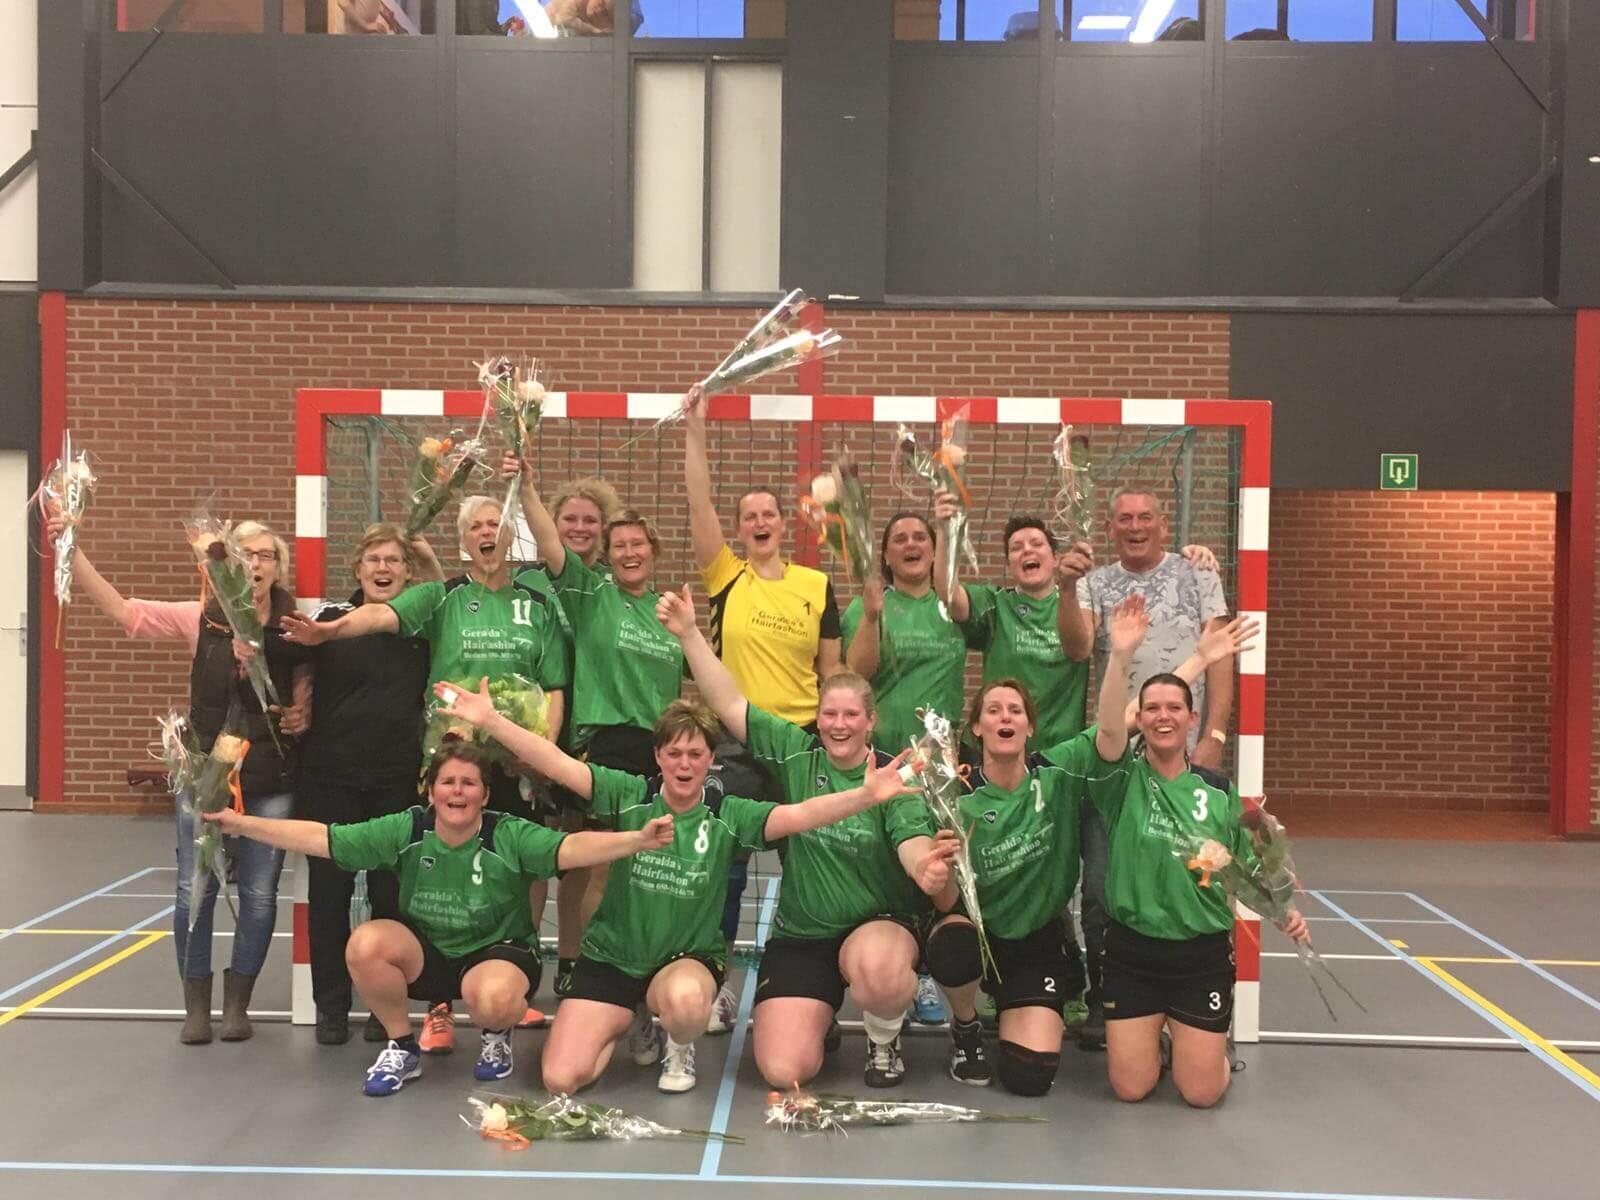 Risja Sportballen: Handbalvereniging Brons in Appingedam KAMPIOEN